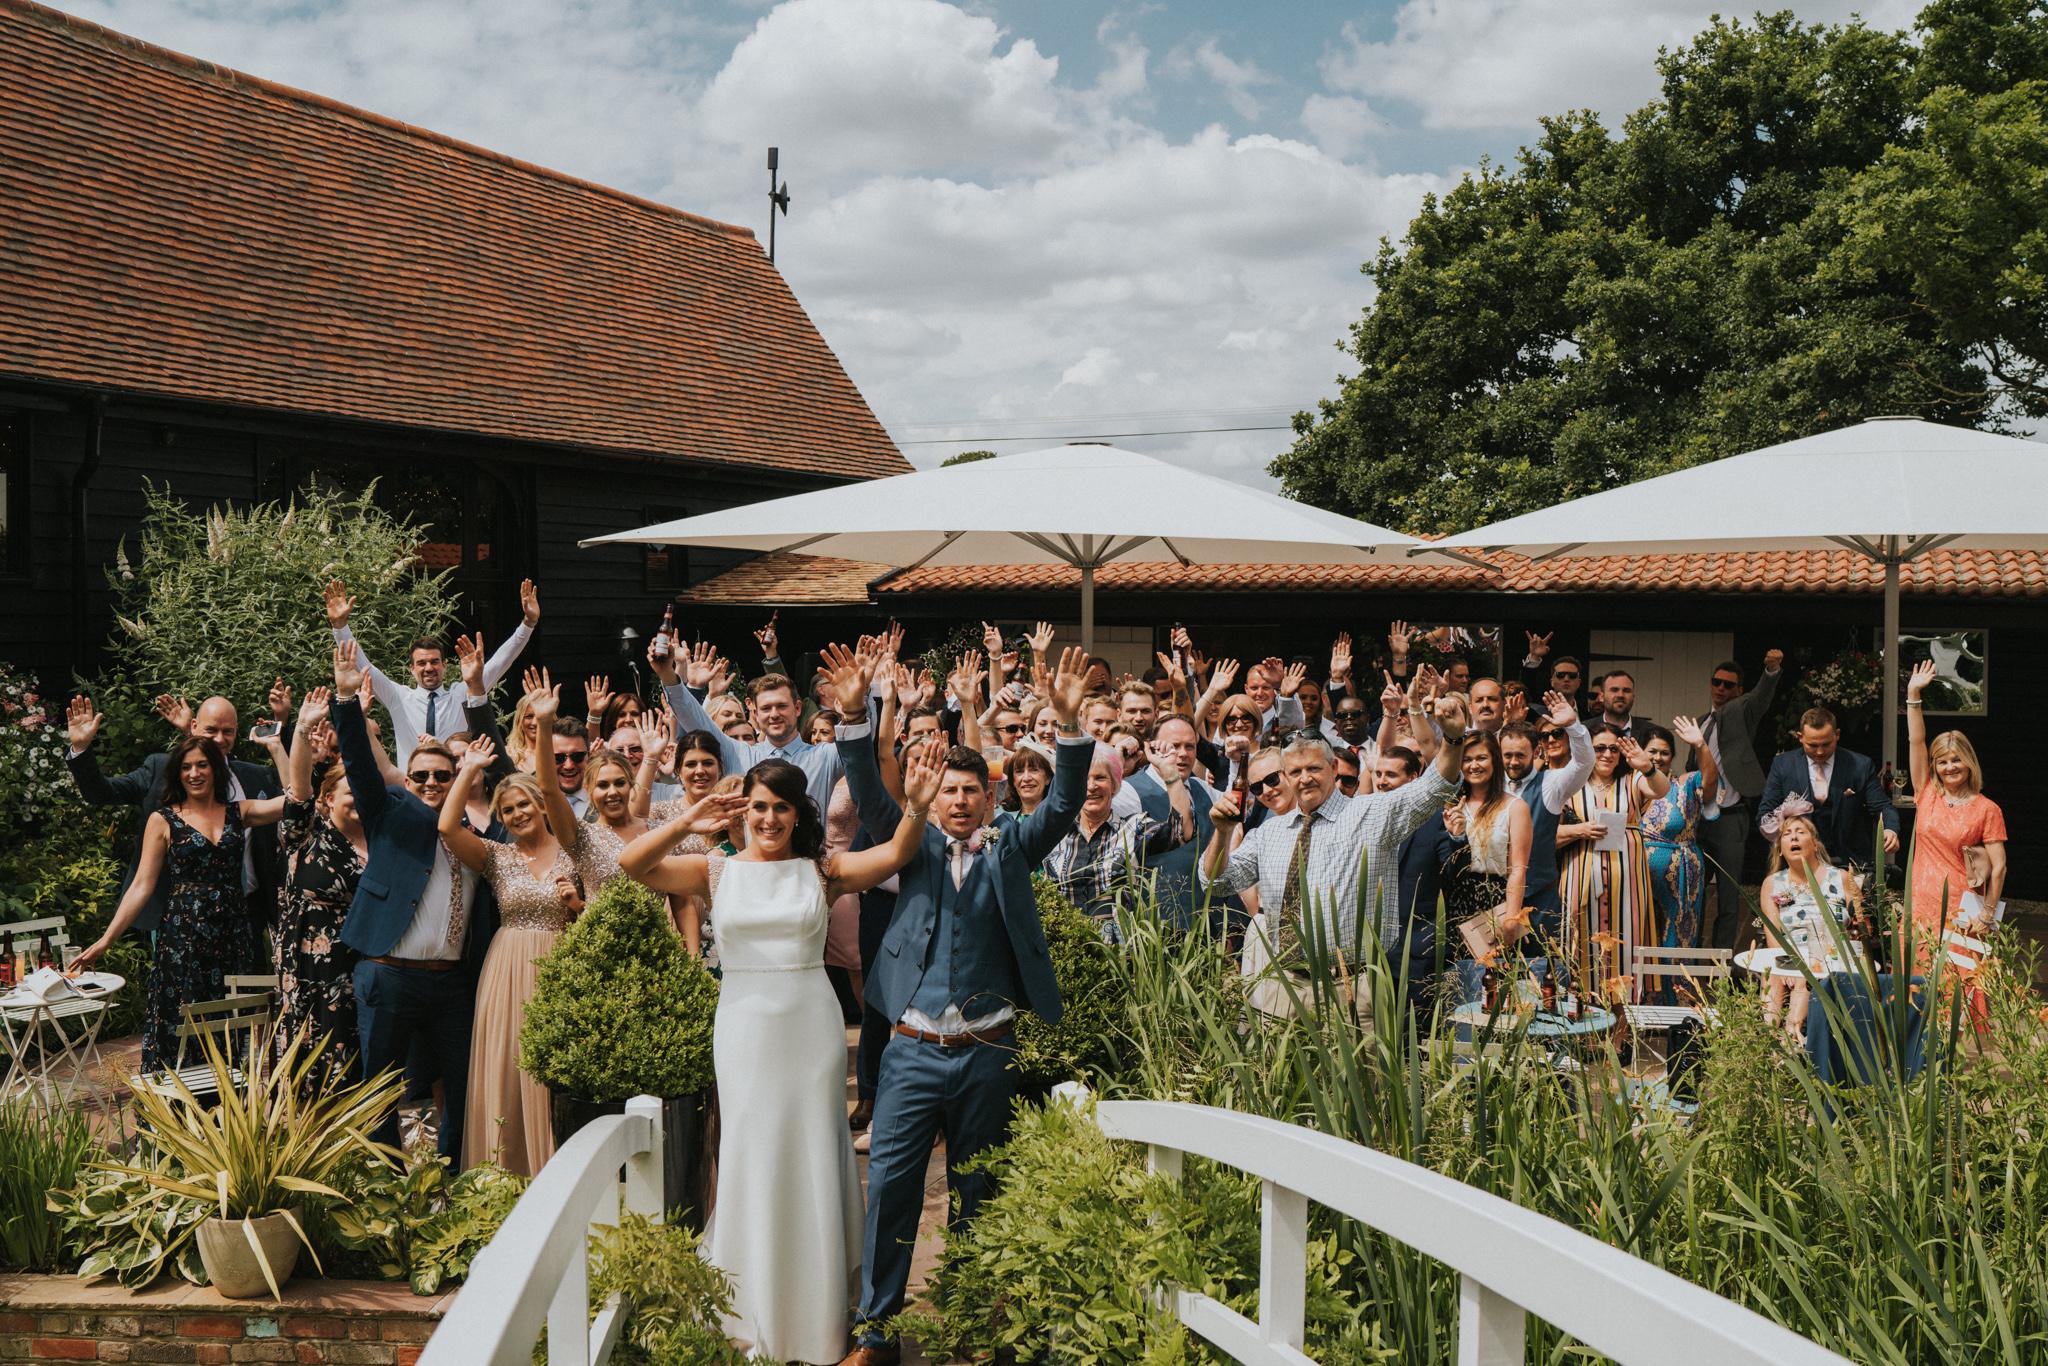 danielle-and-gareths-boho-wedding-previews-at-high-house-weddings-grace-elizabeth-colchester-essex-suffolk-norfolk-devon-alternative-wedding-and-lifestyle-photographer (38 of 76).jpg